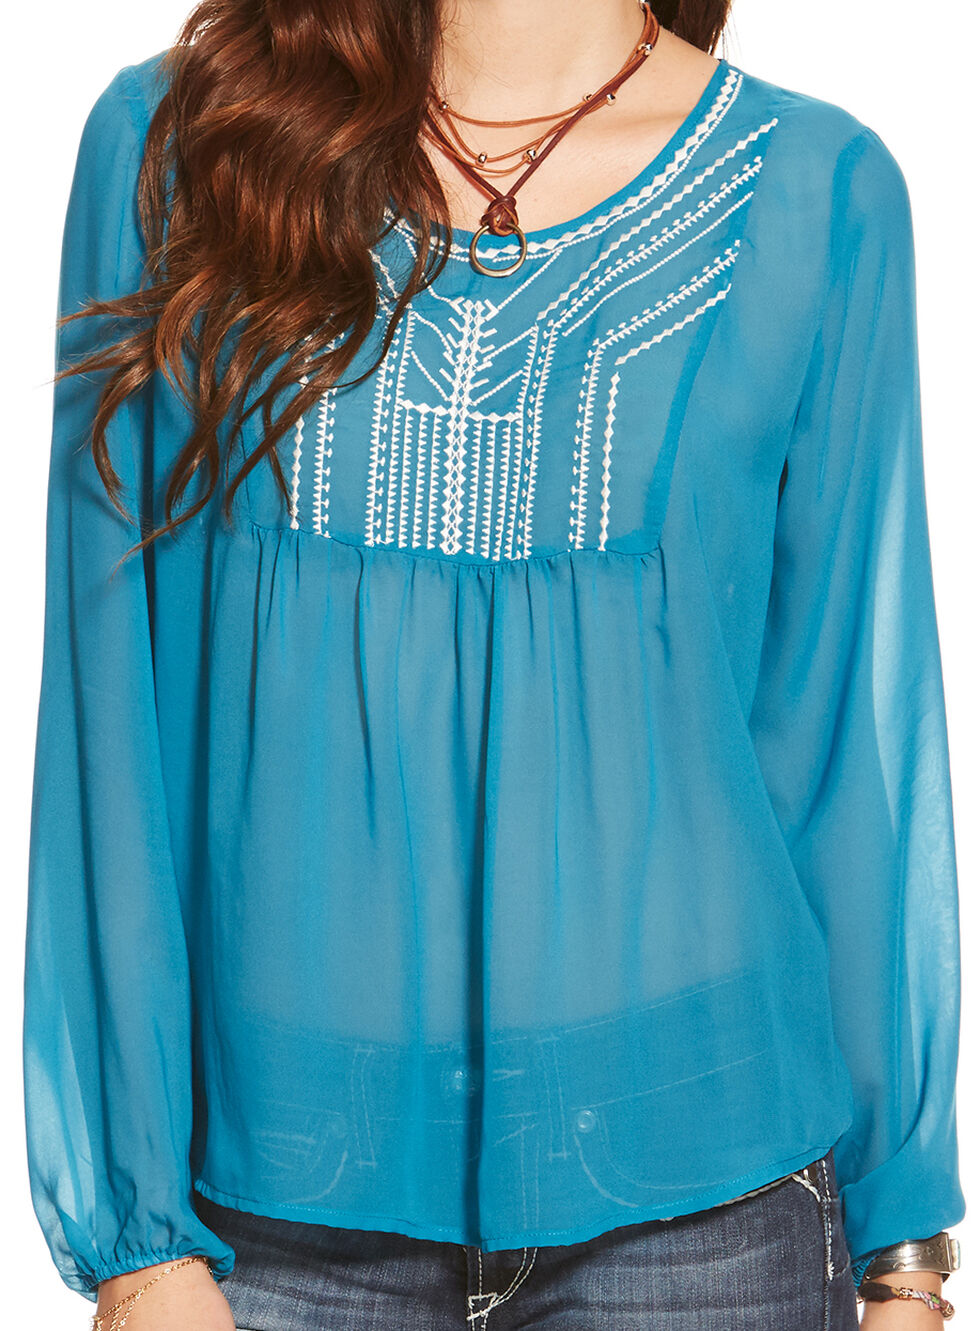 Ariat Women's Celestial Blue Molly Chiffon Top , Blue, hi-res